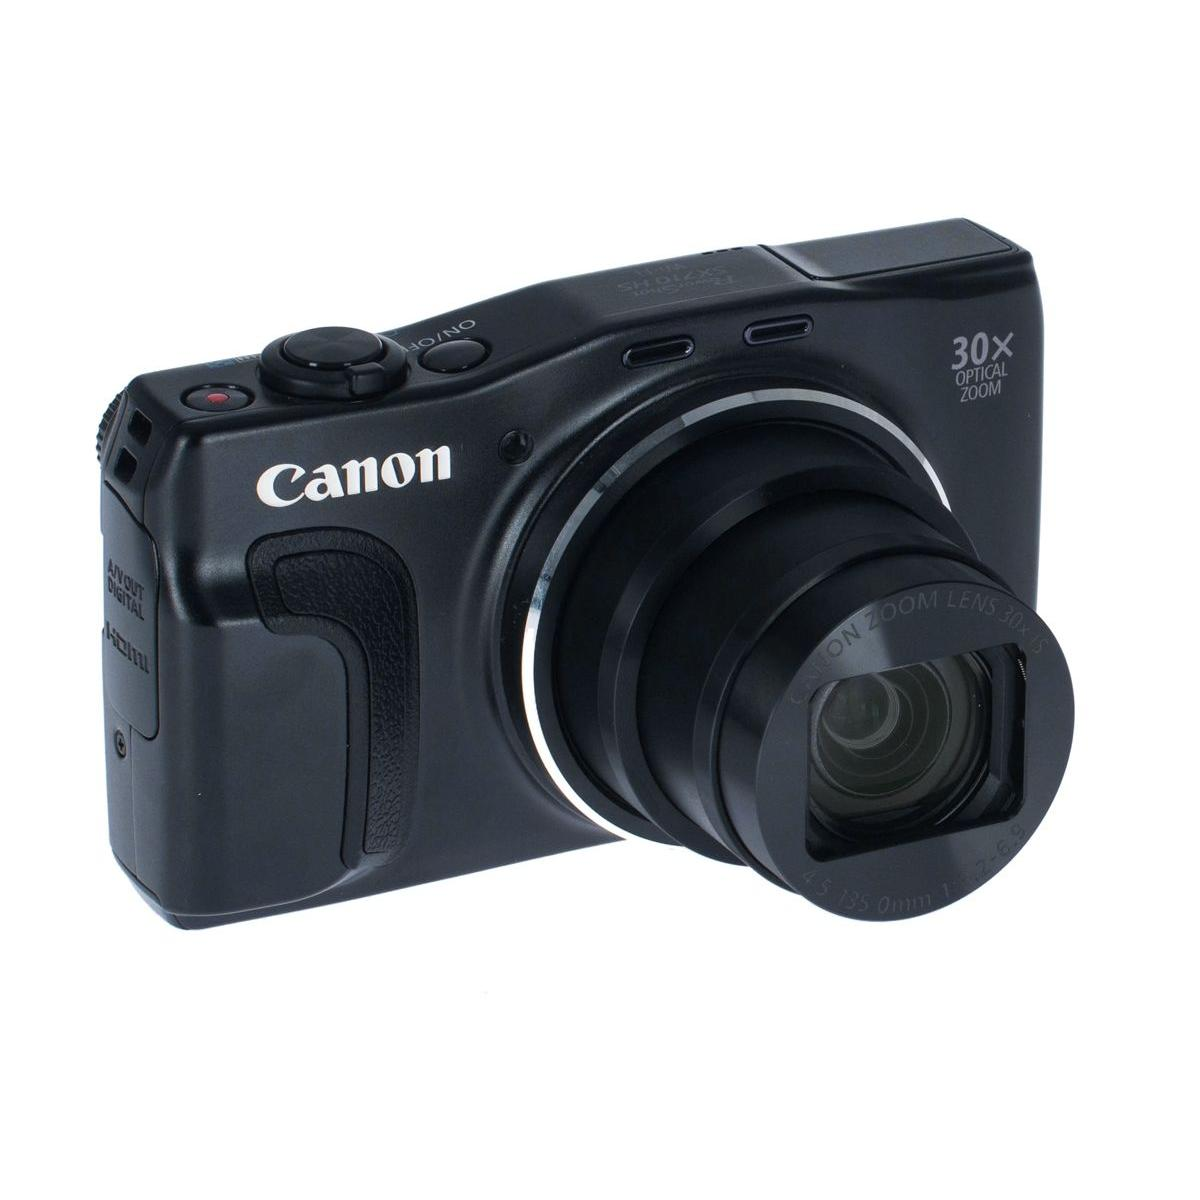 FOTOru  магазин фотоаппаратов и цифровой техники